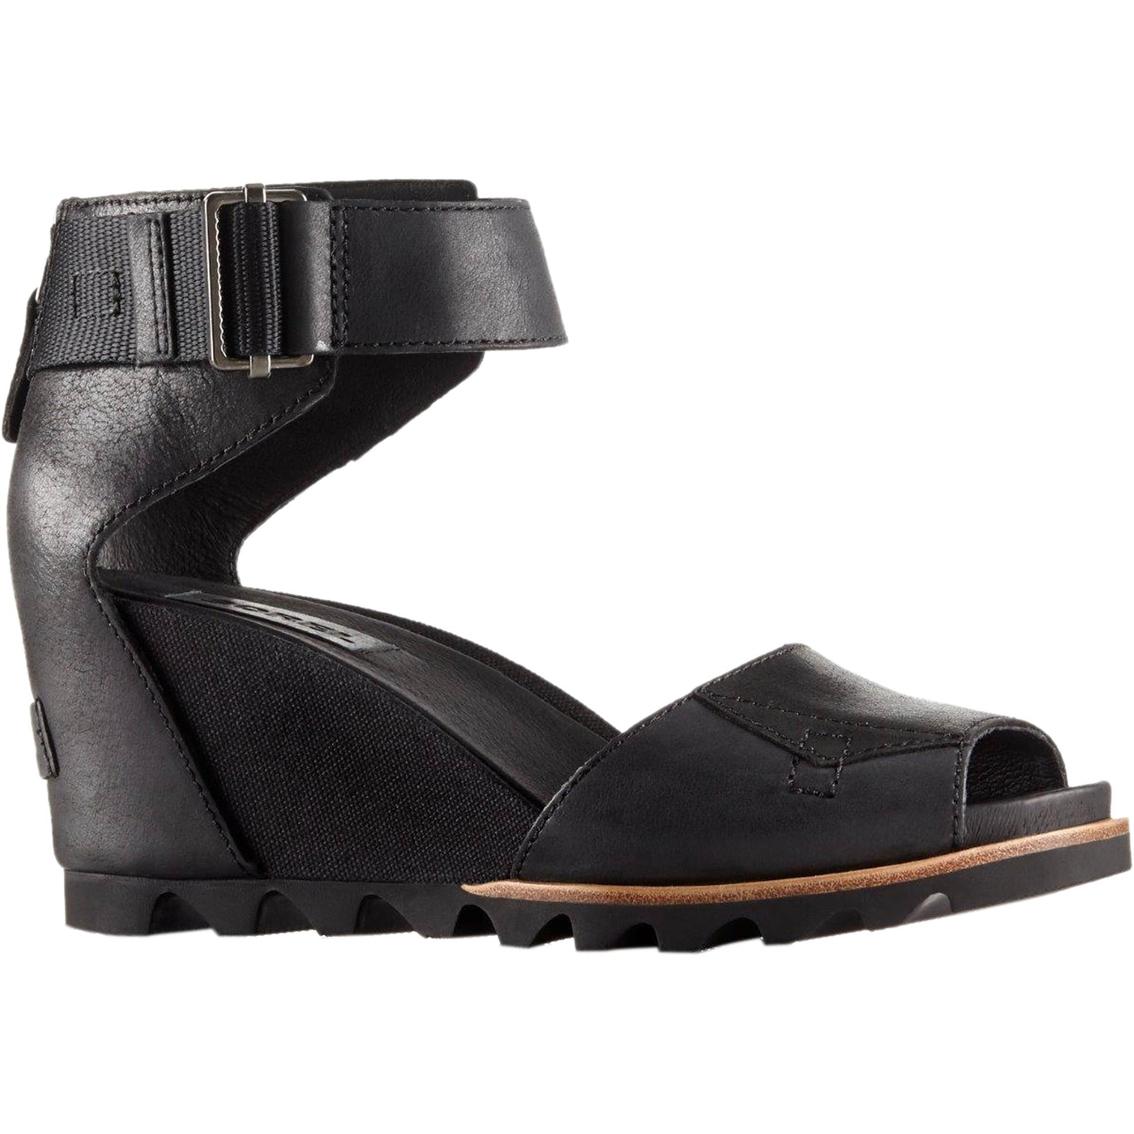 af4e0c03d7e Sorel Joanie Wedge Sandals